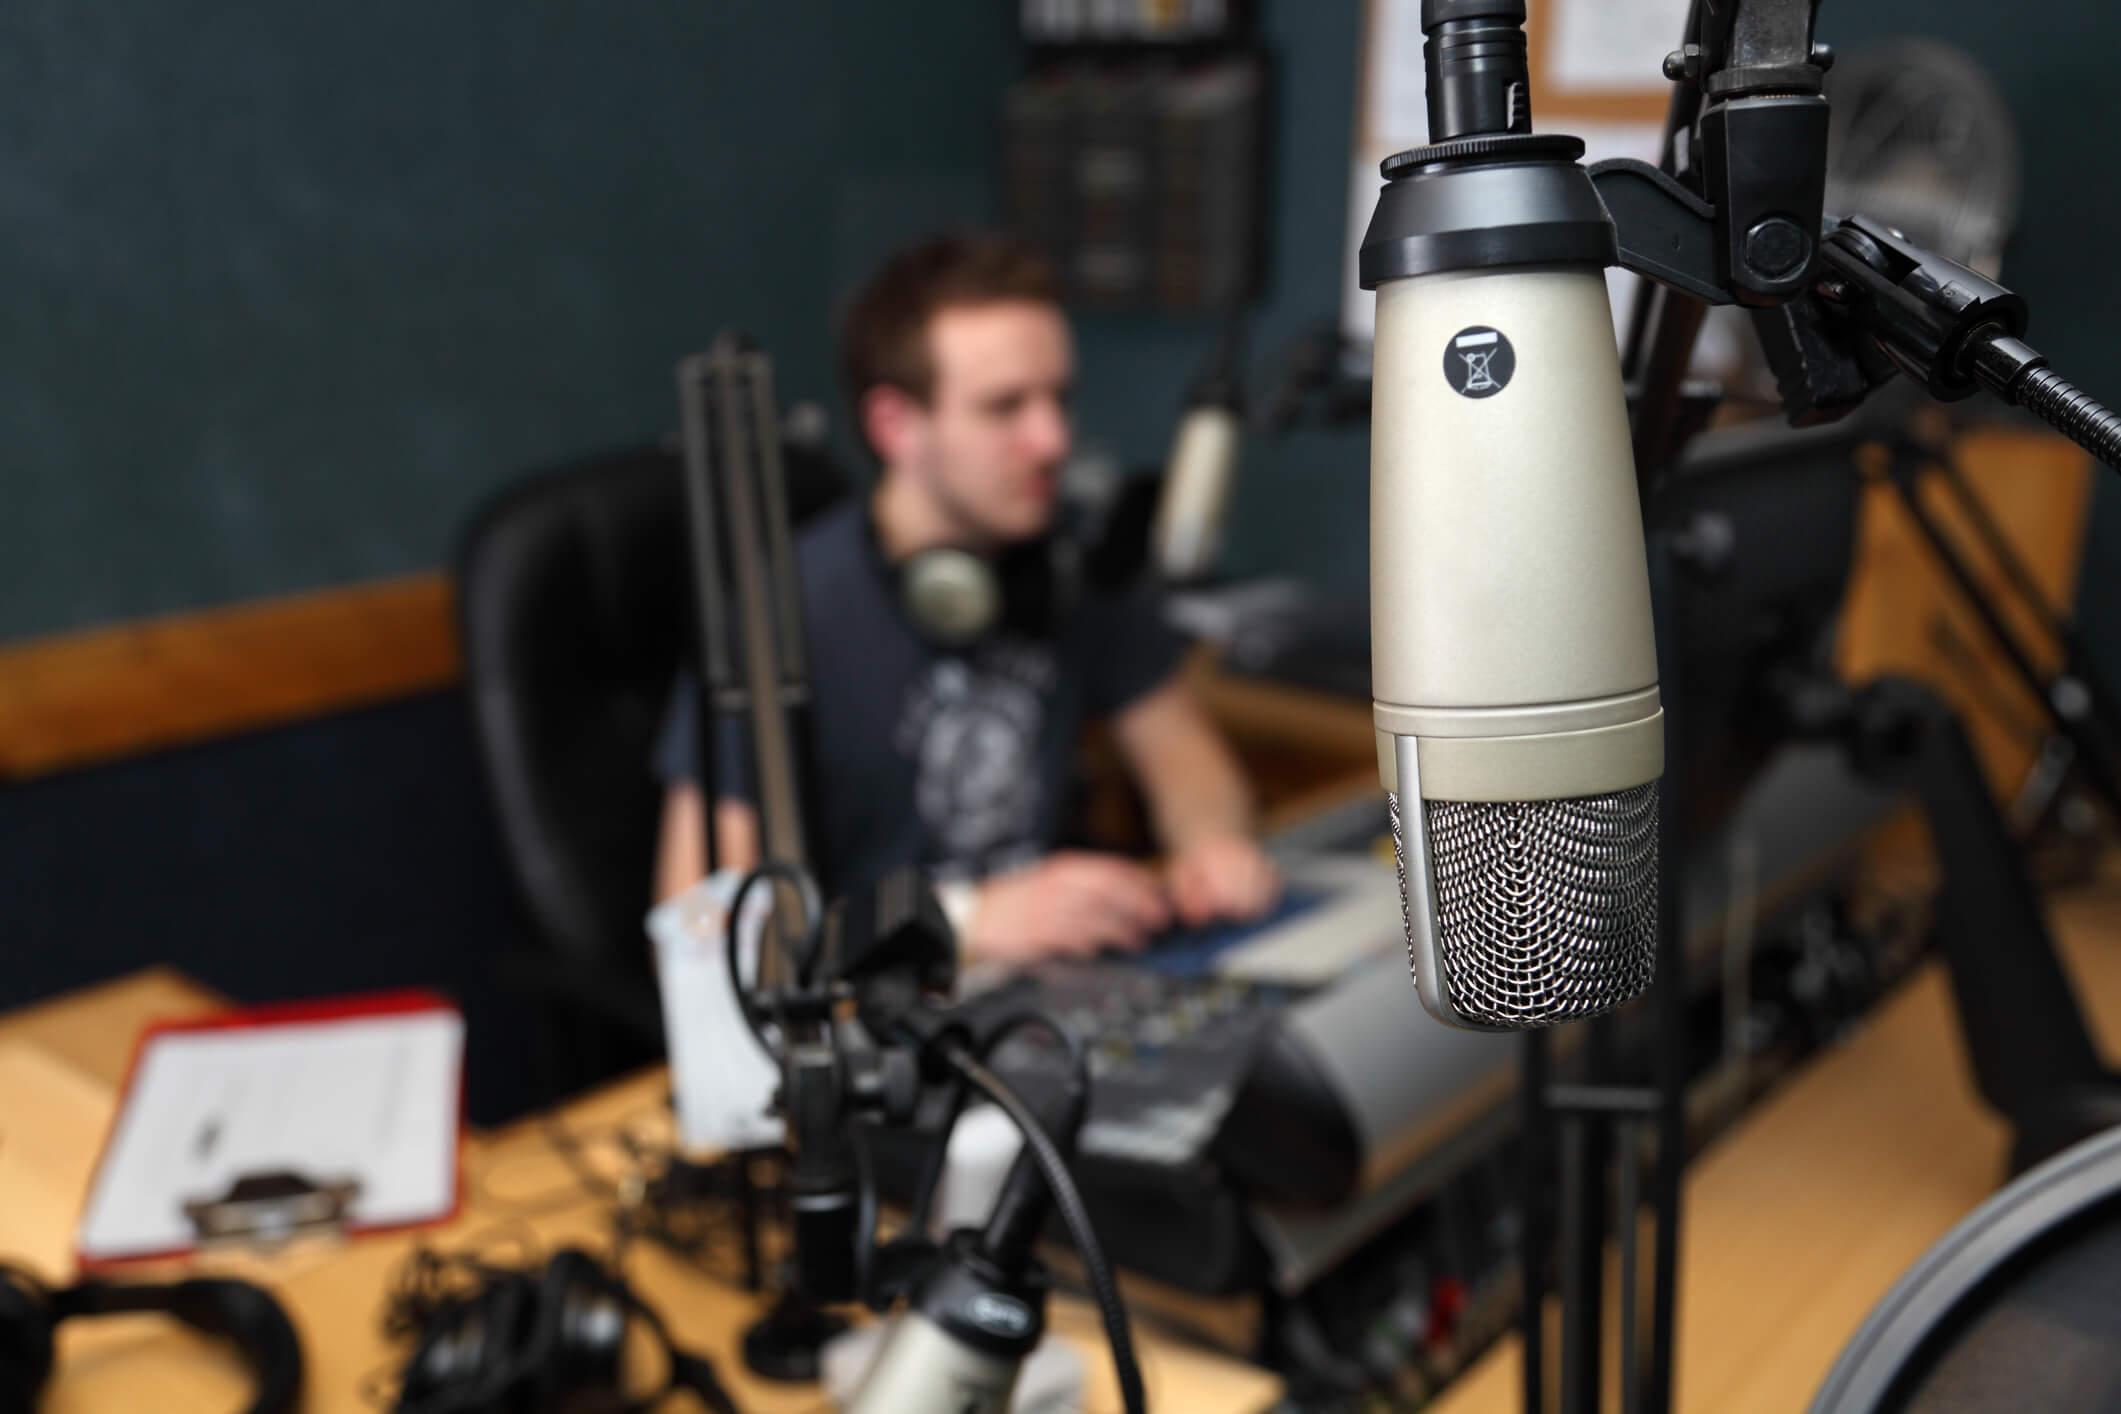 Nomes Para Programas De Radio E Slogans Veja Exemplos E Inspire Se